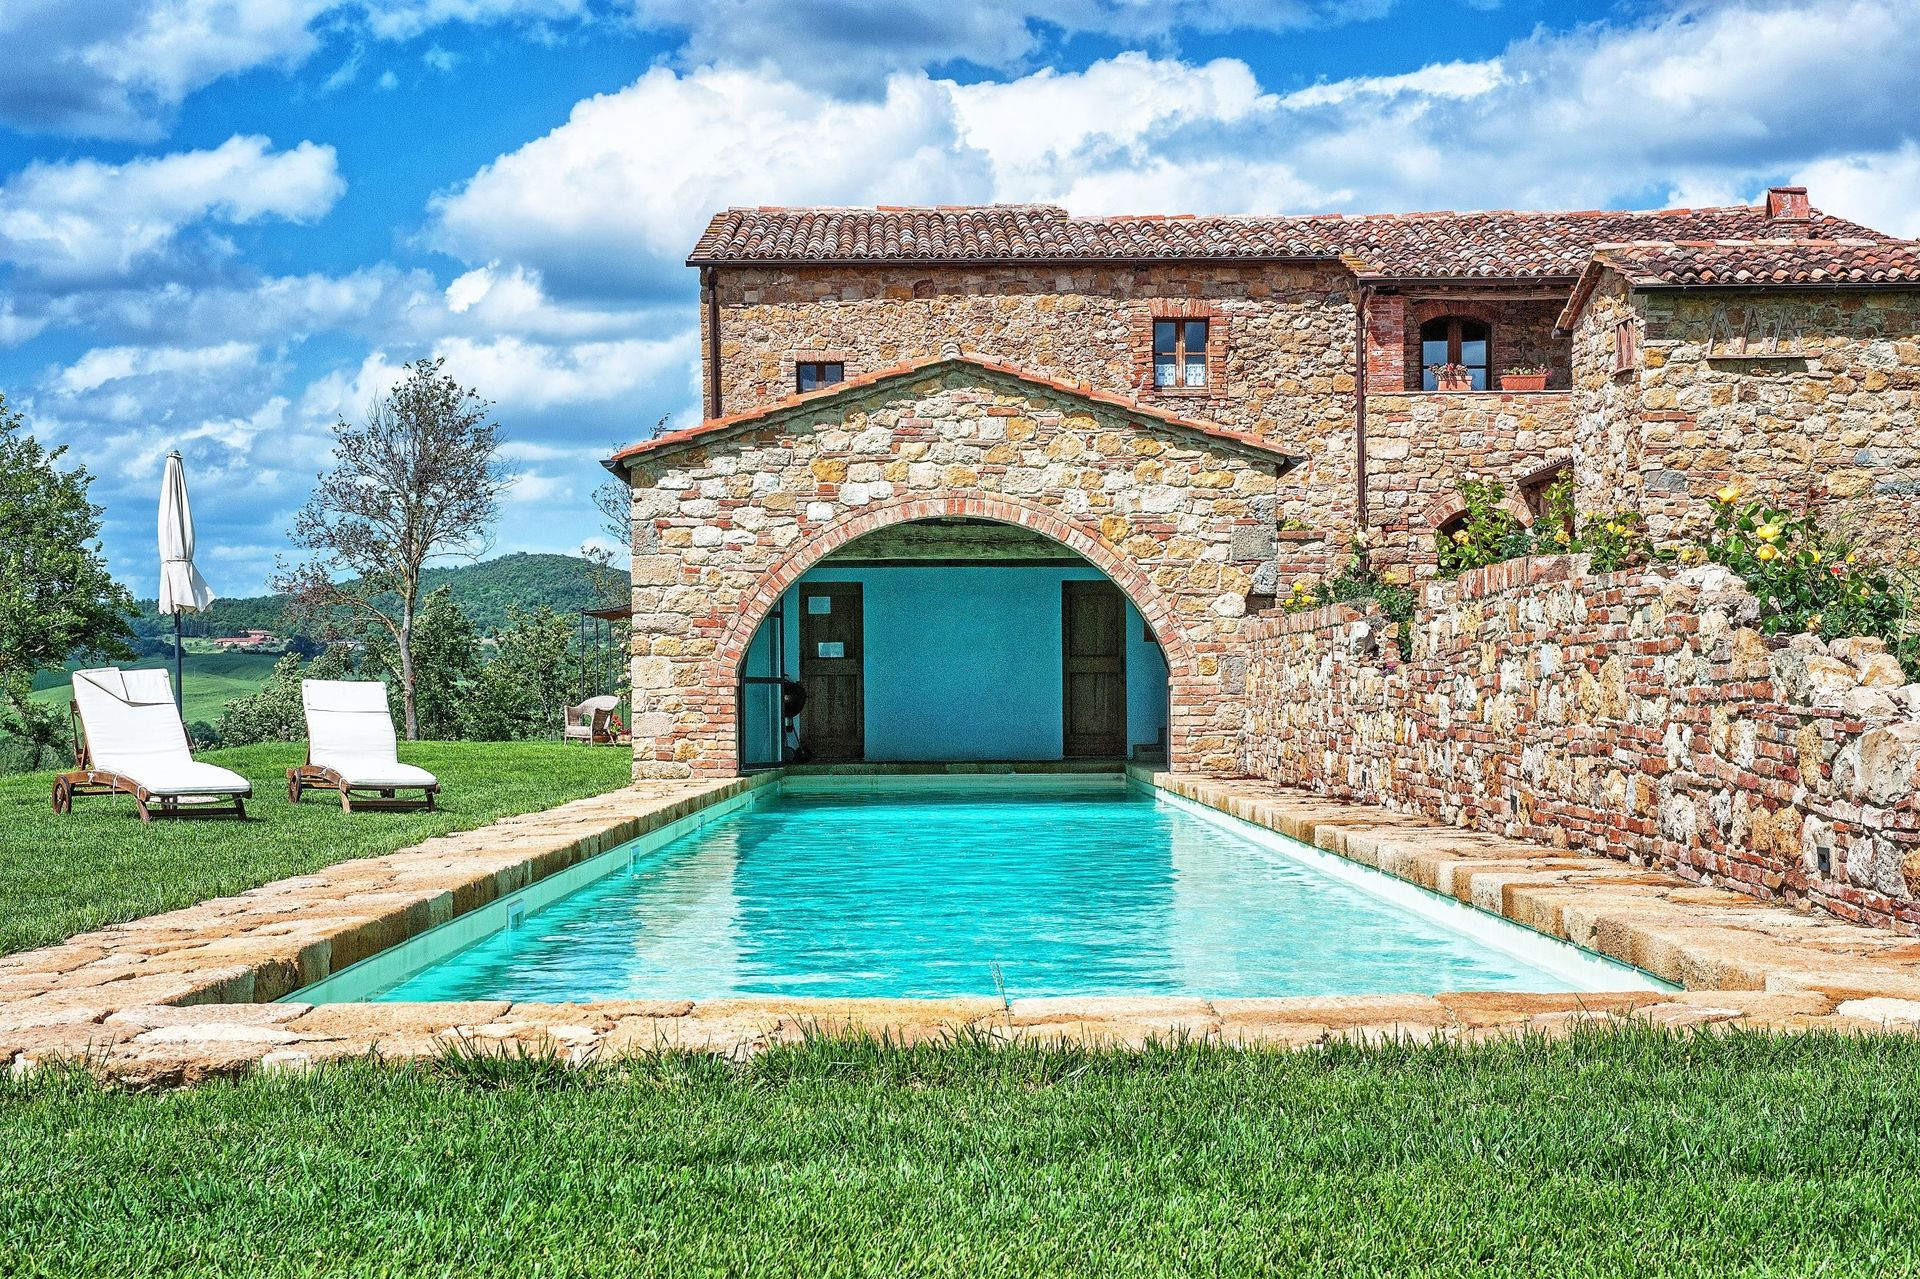 Casale pienza casa vacanze con 14 posti letto in 8 camere pienza toscana italia - Casale in toscana ...